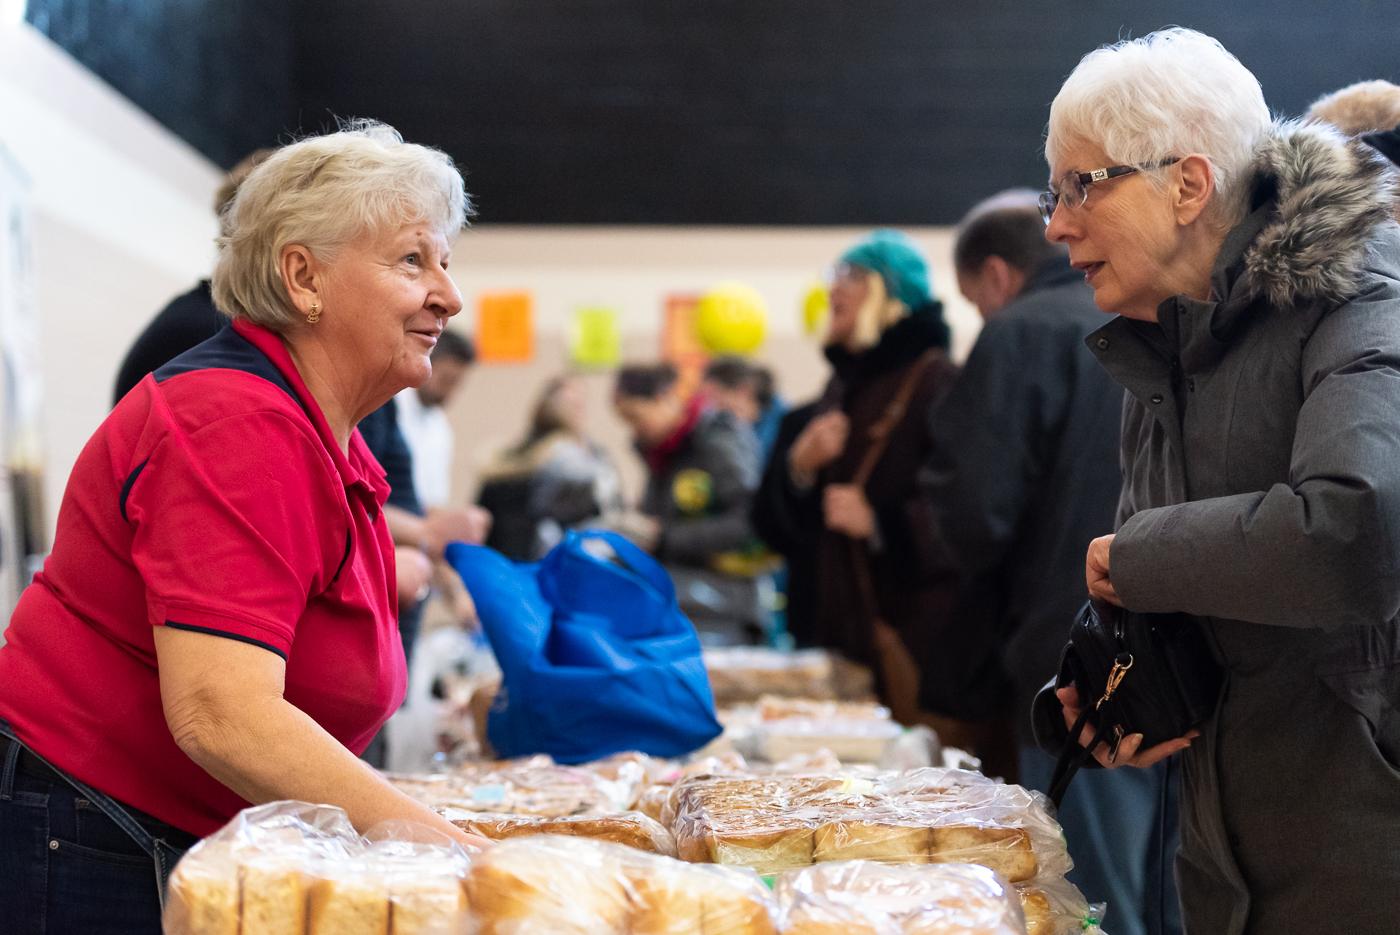 Spring Indoor Farmers' Market - Image 4